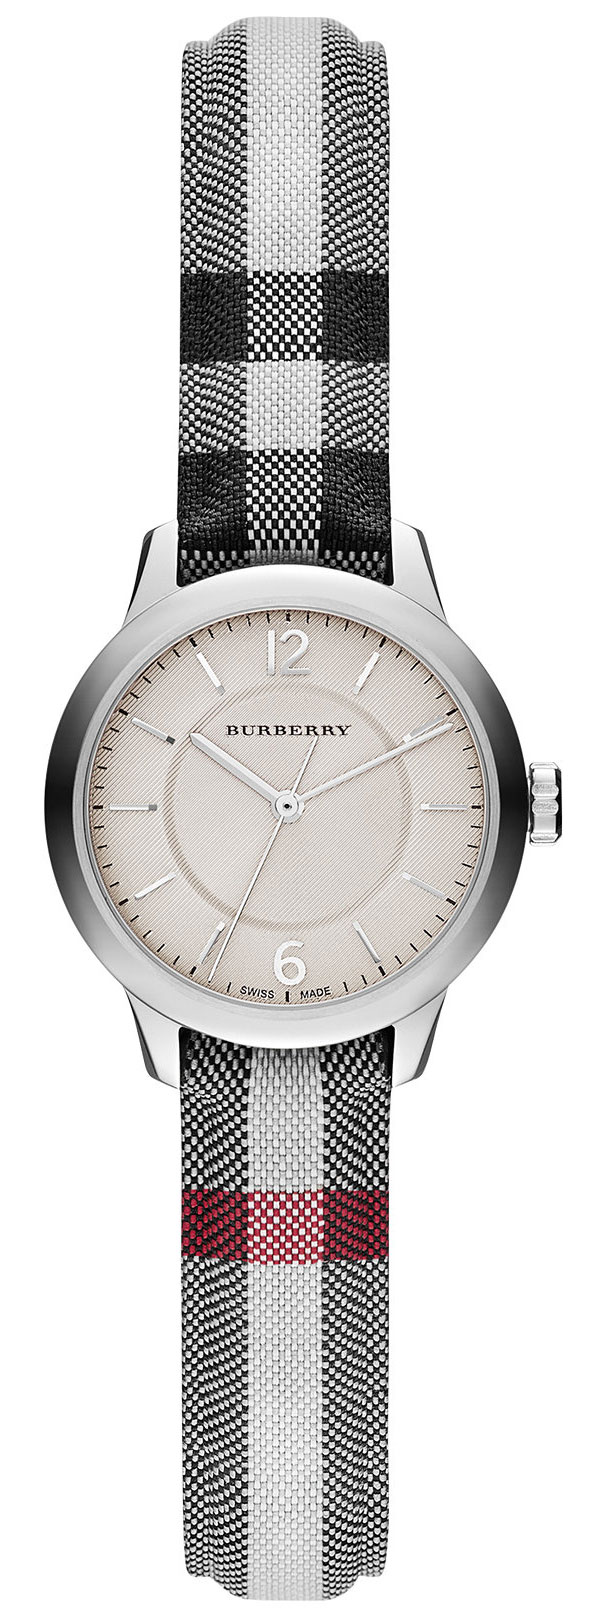 Burberry-Womens-Swiss-Stone-Check-Fabric-Strap-26mm-BU10200